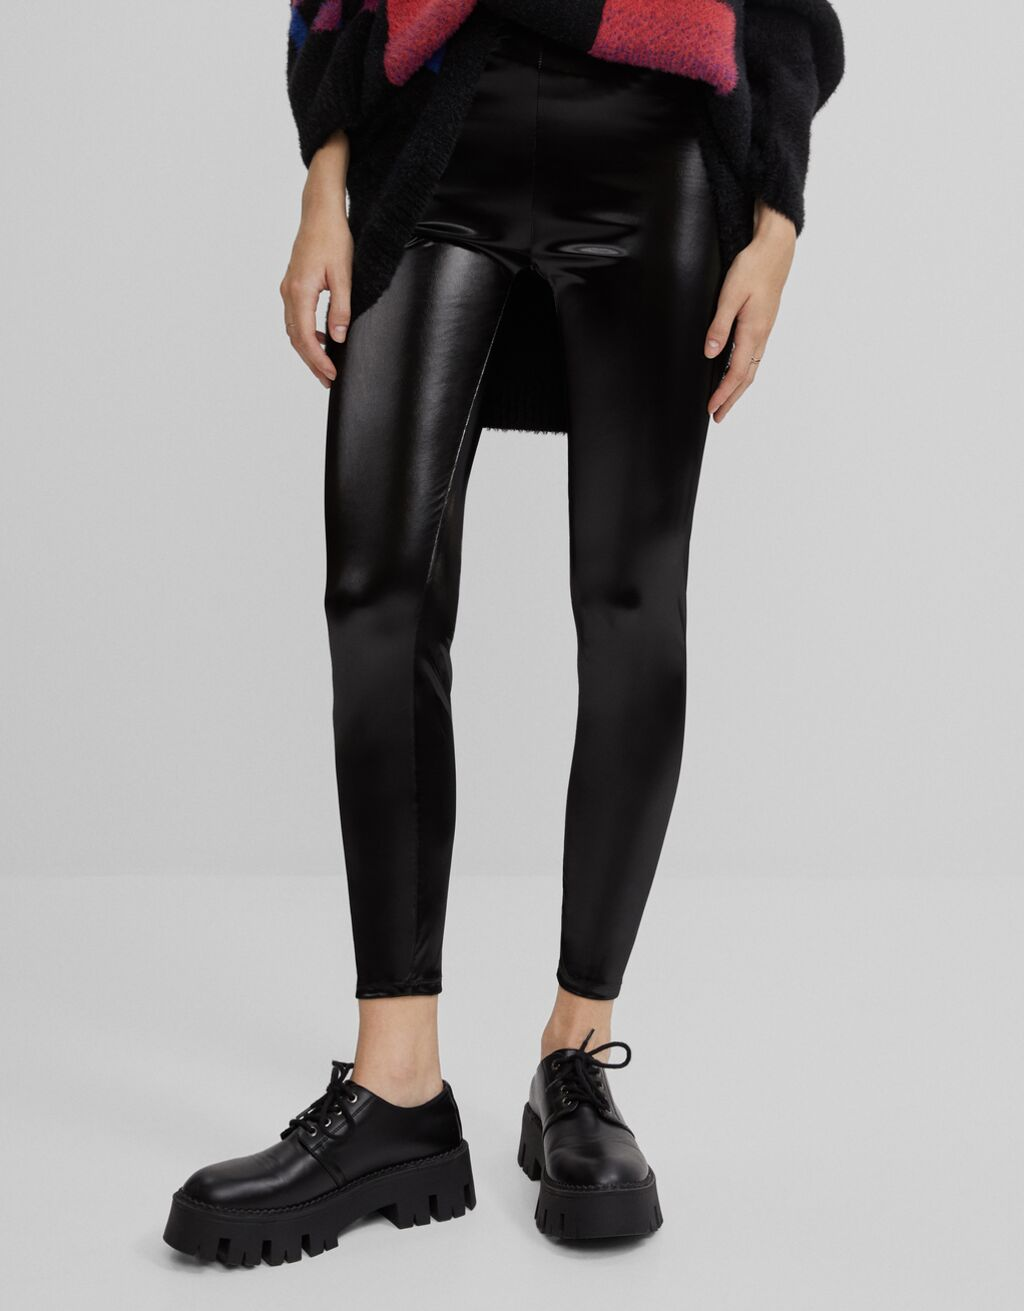 Legging vinilo-Negro-0